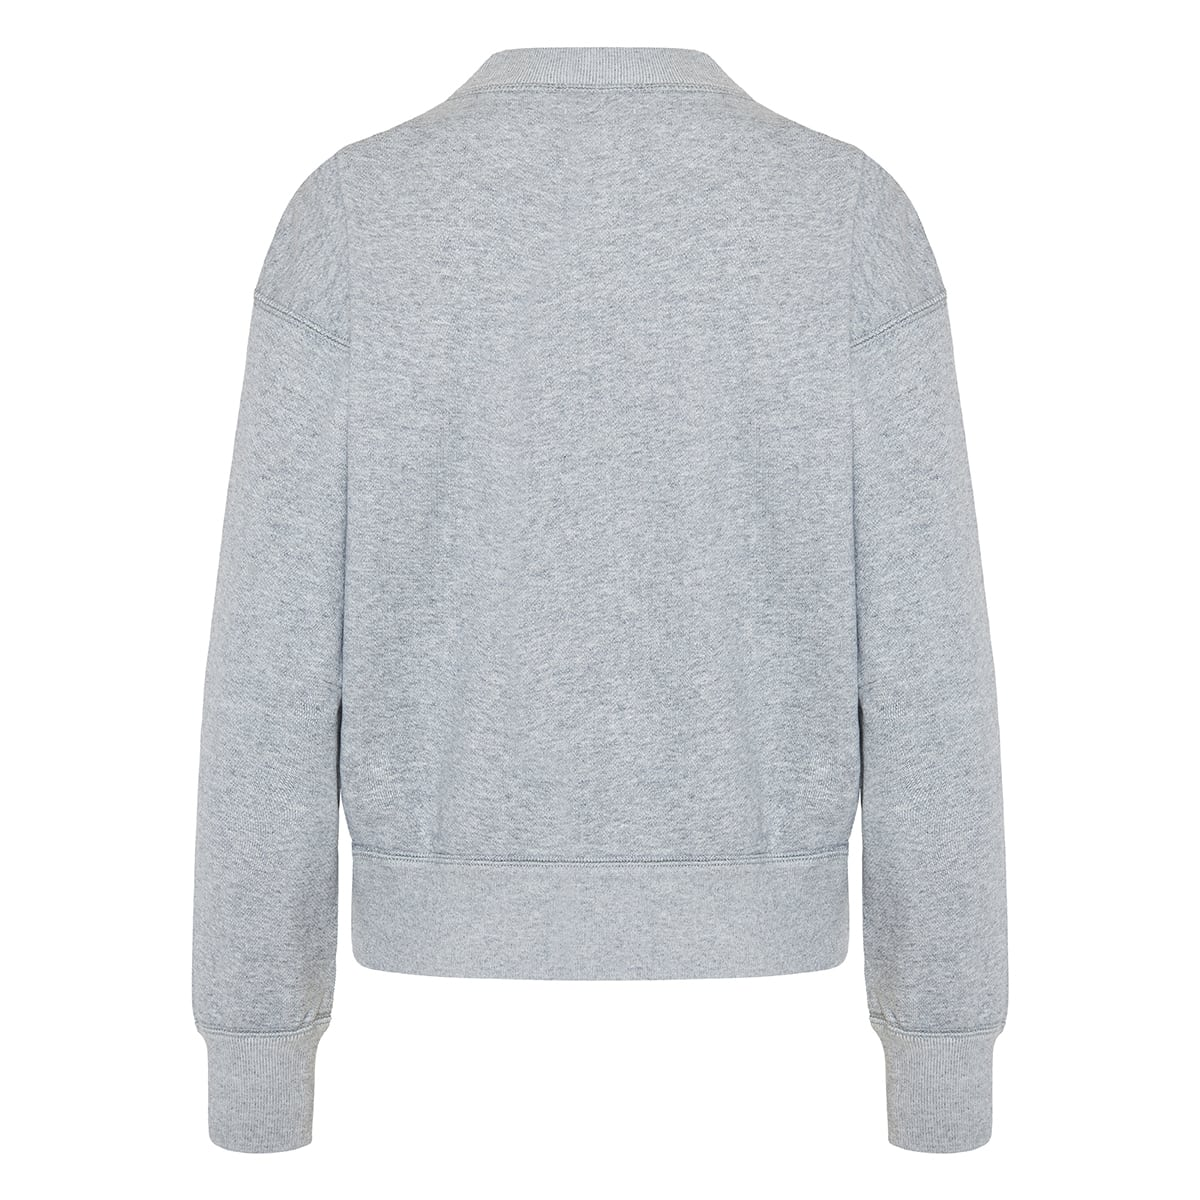 Moby logo cotton sweatshirt